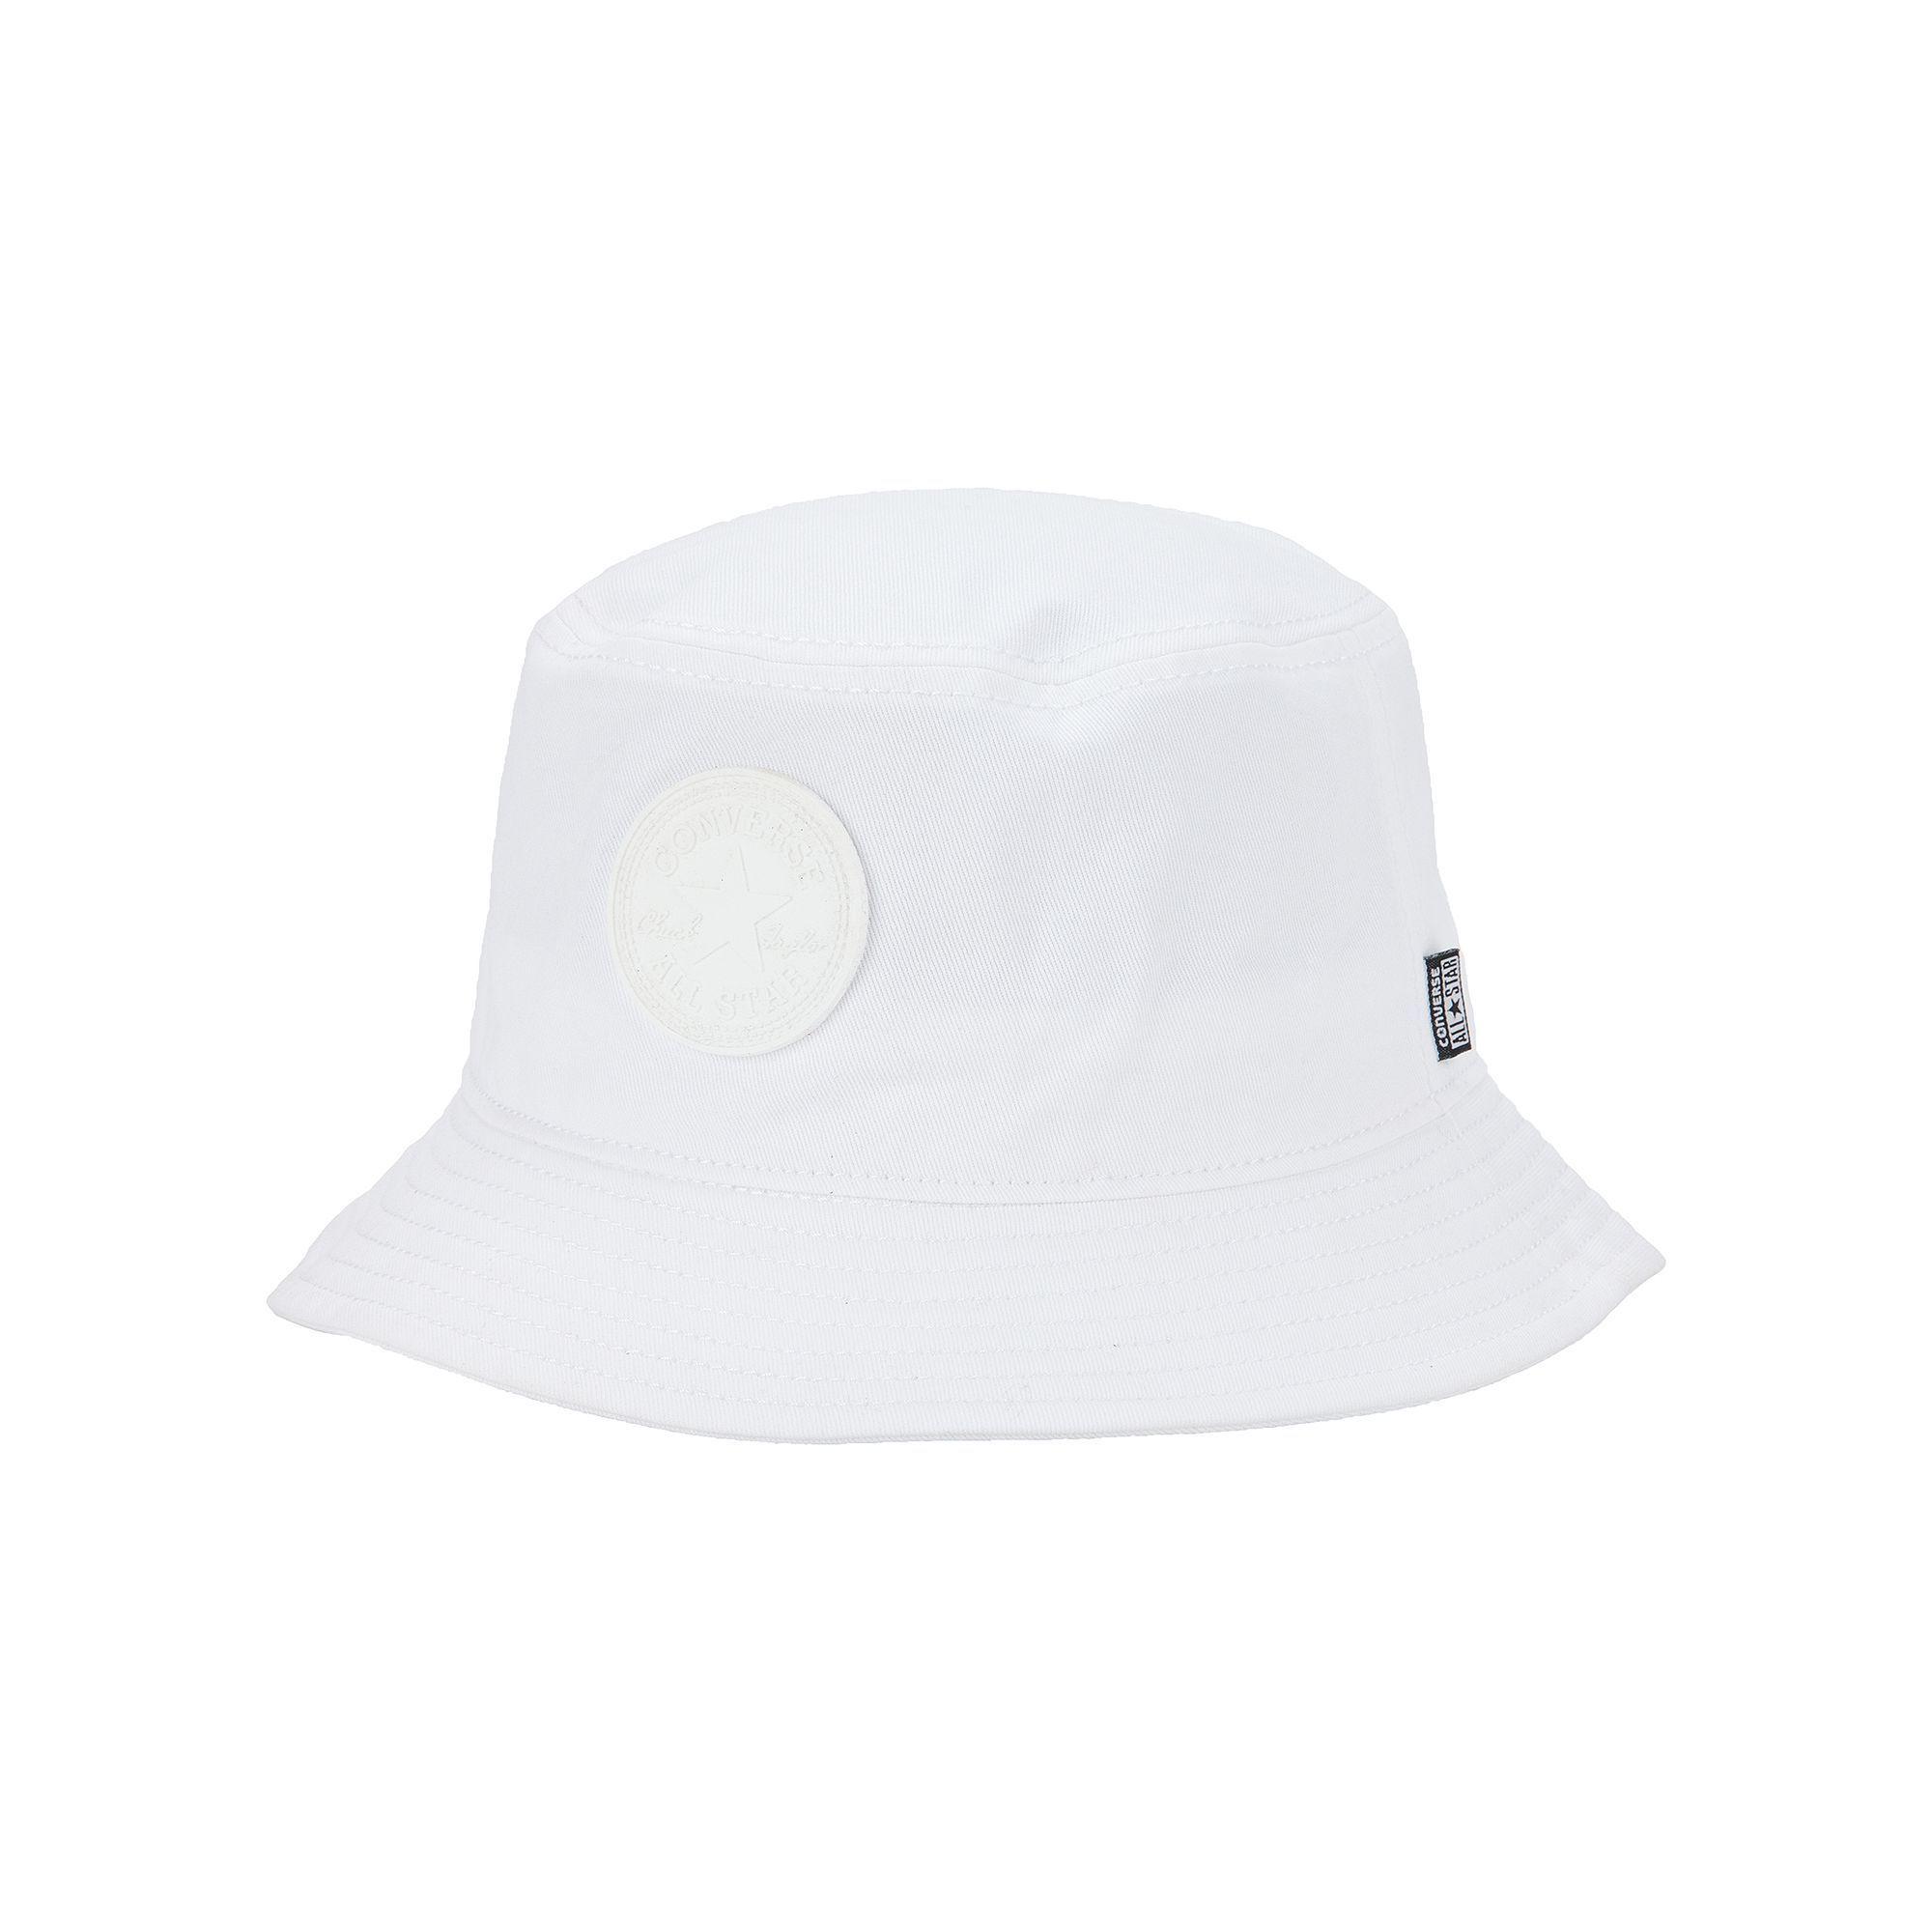 ba3c13d6 Adult Converse All Star Chuck Taylor Monochrome Bucket Hat, Men's, Size: L/ XL, White